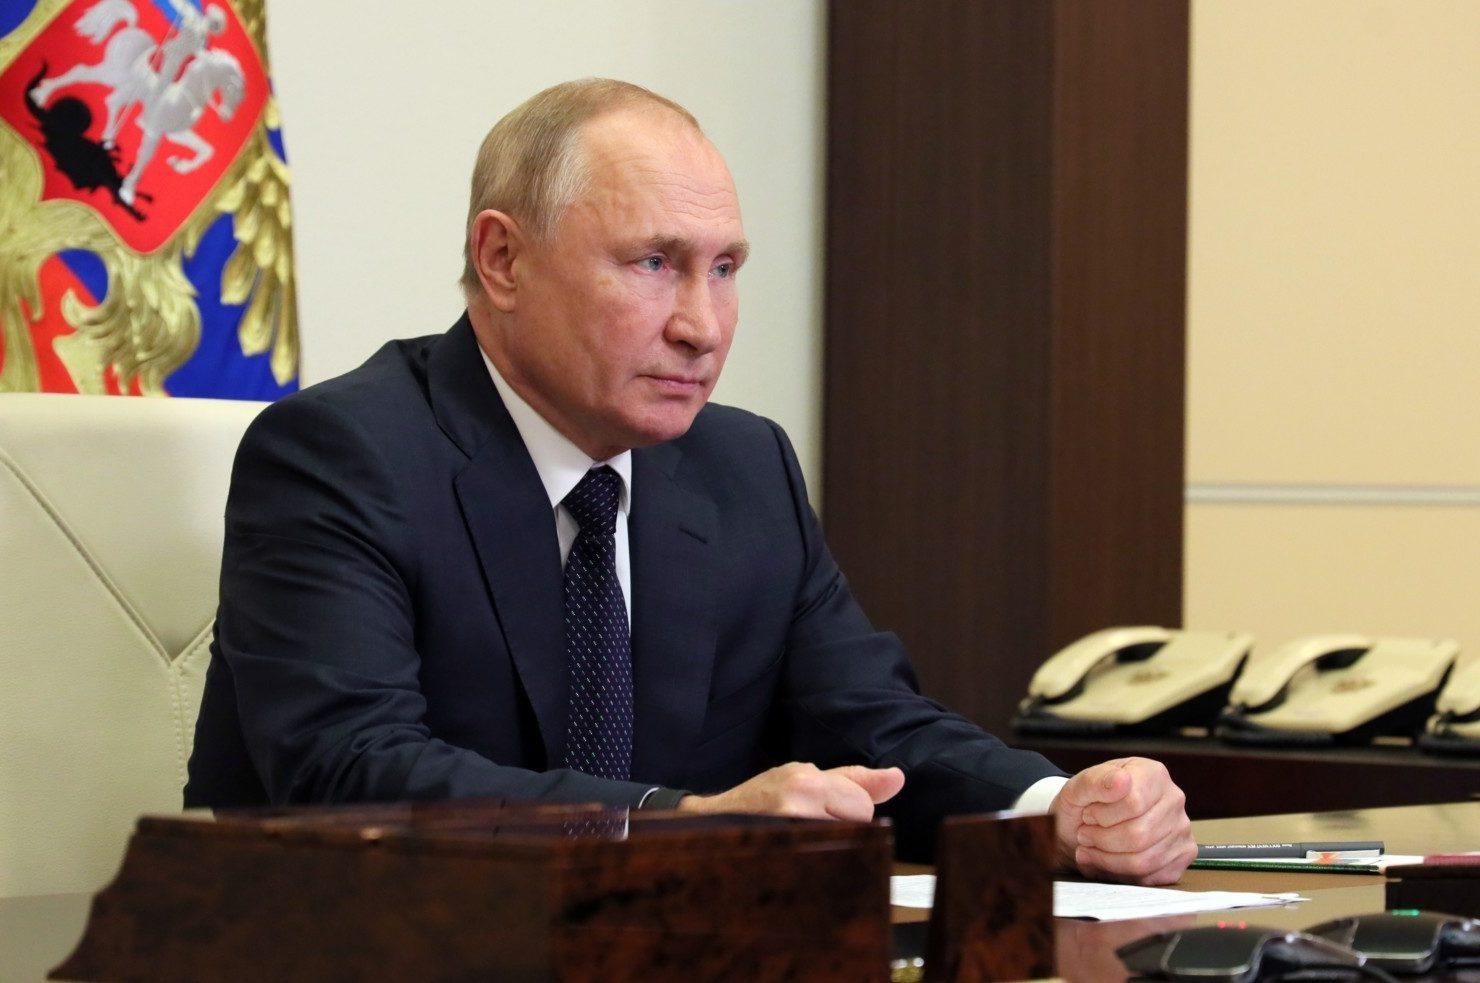 Президент РФ Владимир Путин. Евгений Паулин / РИА Новости